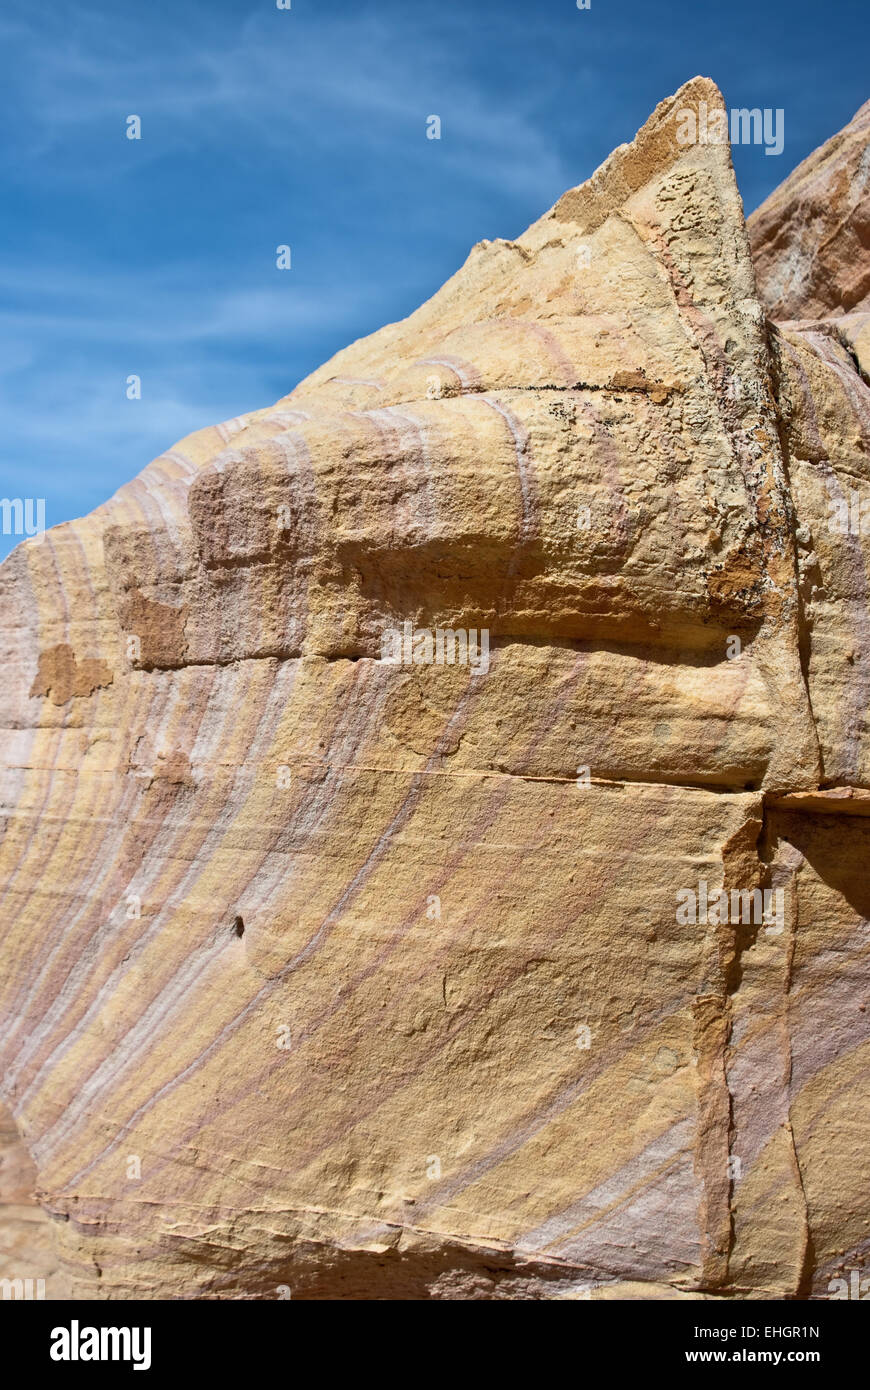 Sandstone rock formations imitate shark fins - Stock Image